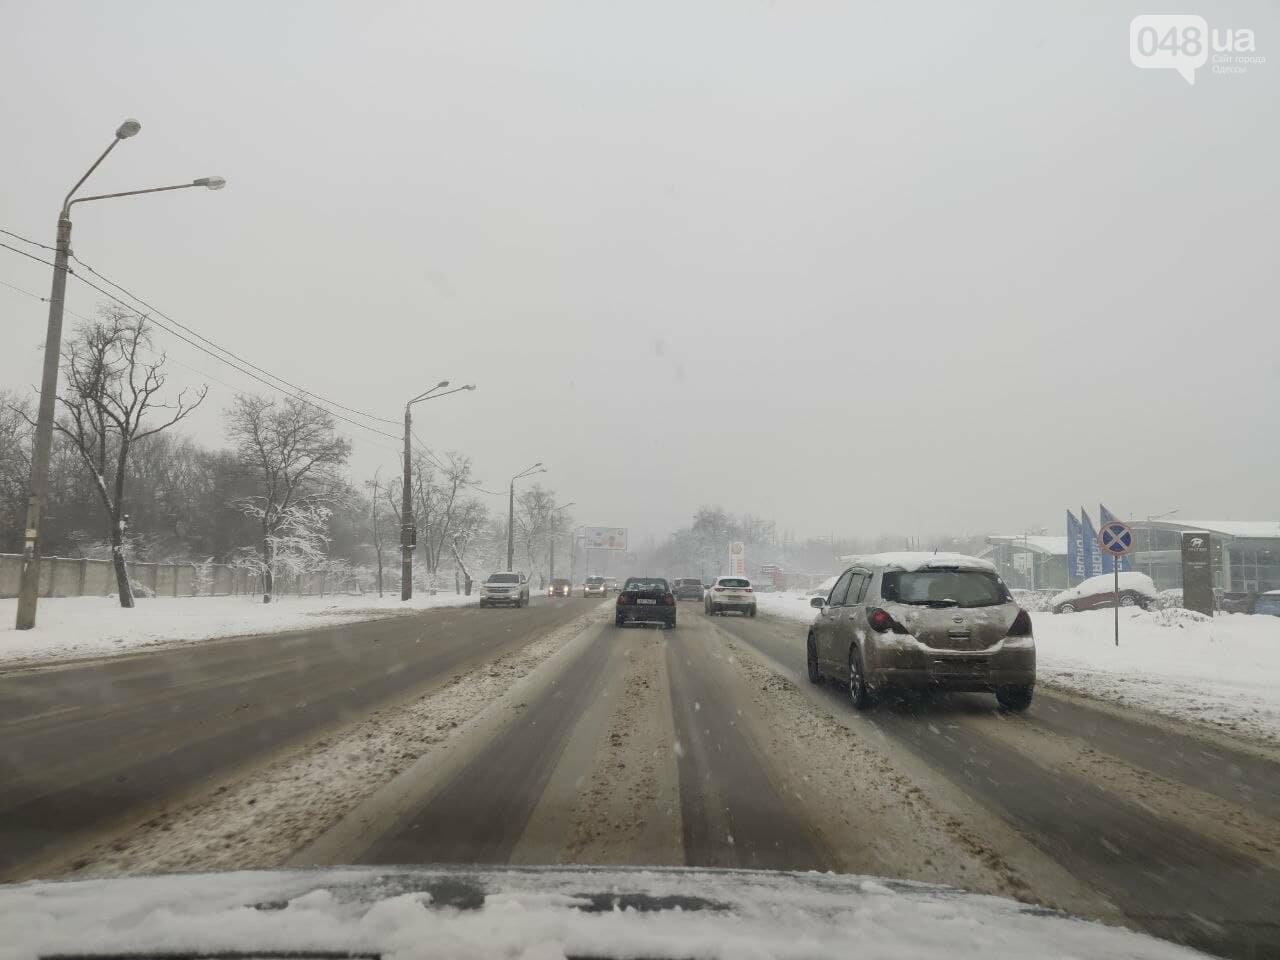 Одессу замело: ситуация на дорогах и тротуарах в городе, - ФОТО, фото-8